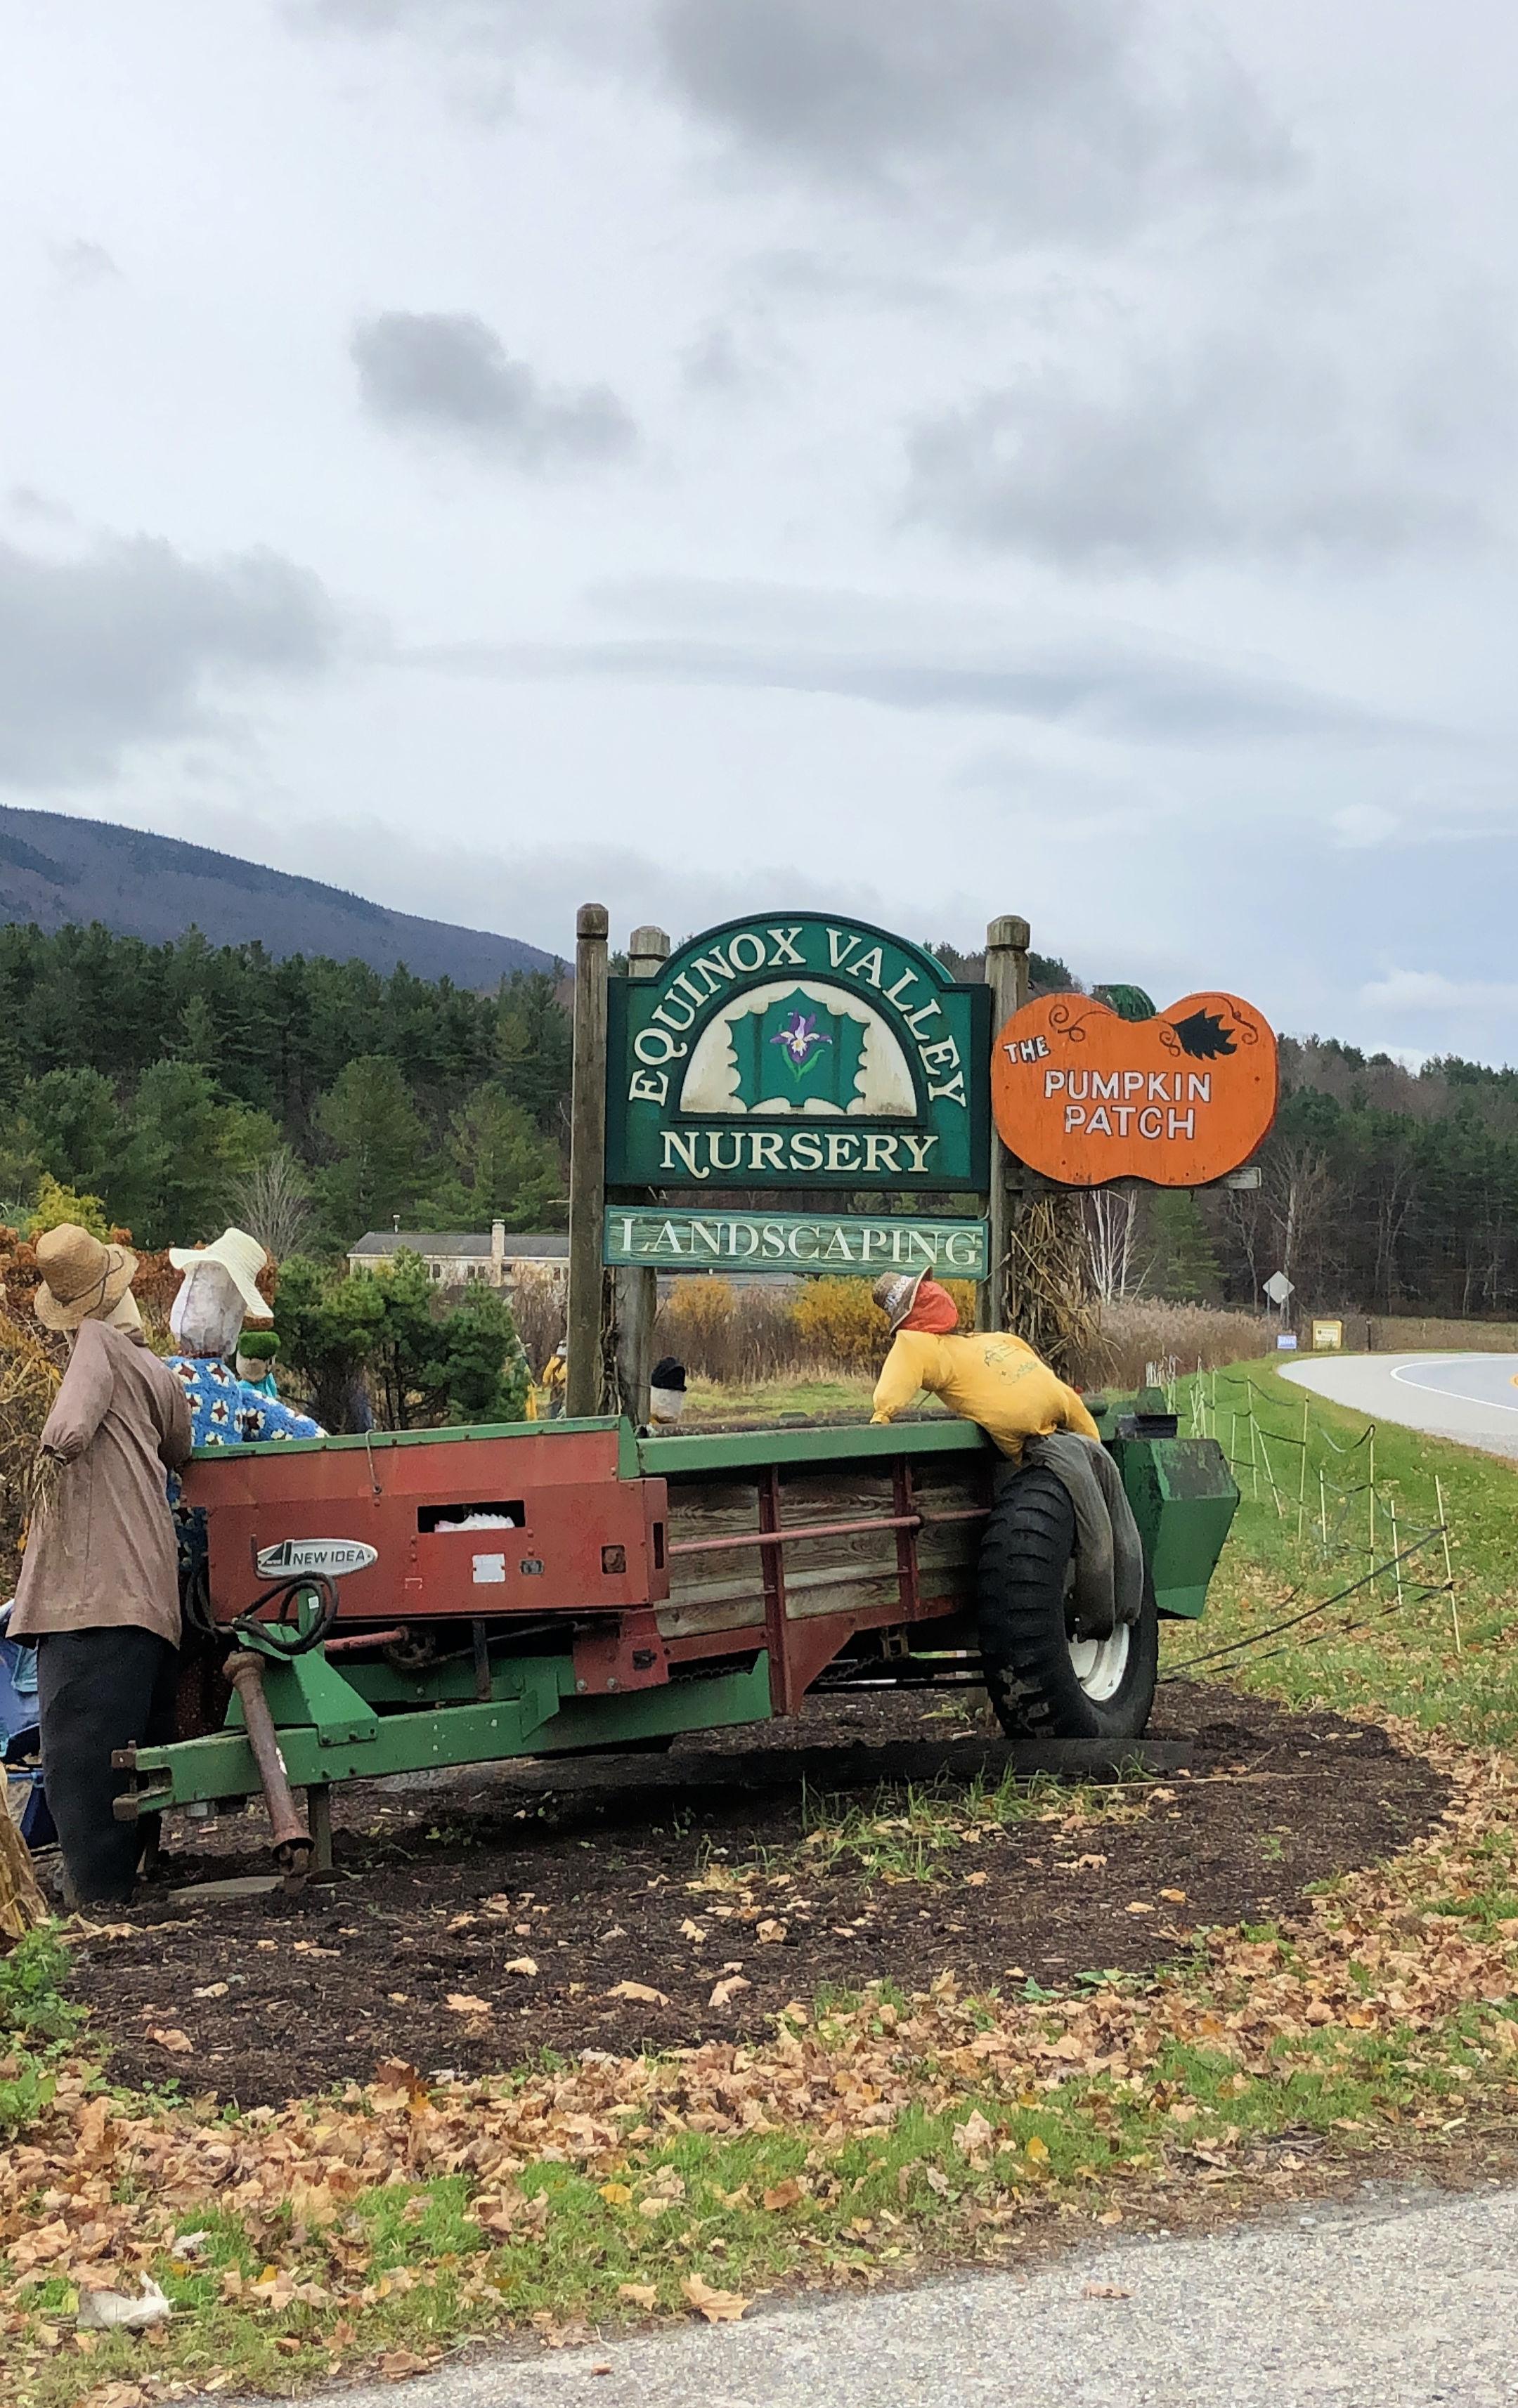 equinox pumpkin patch